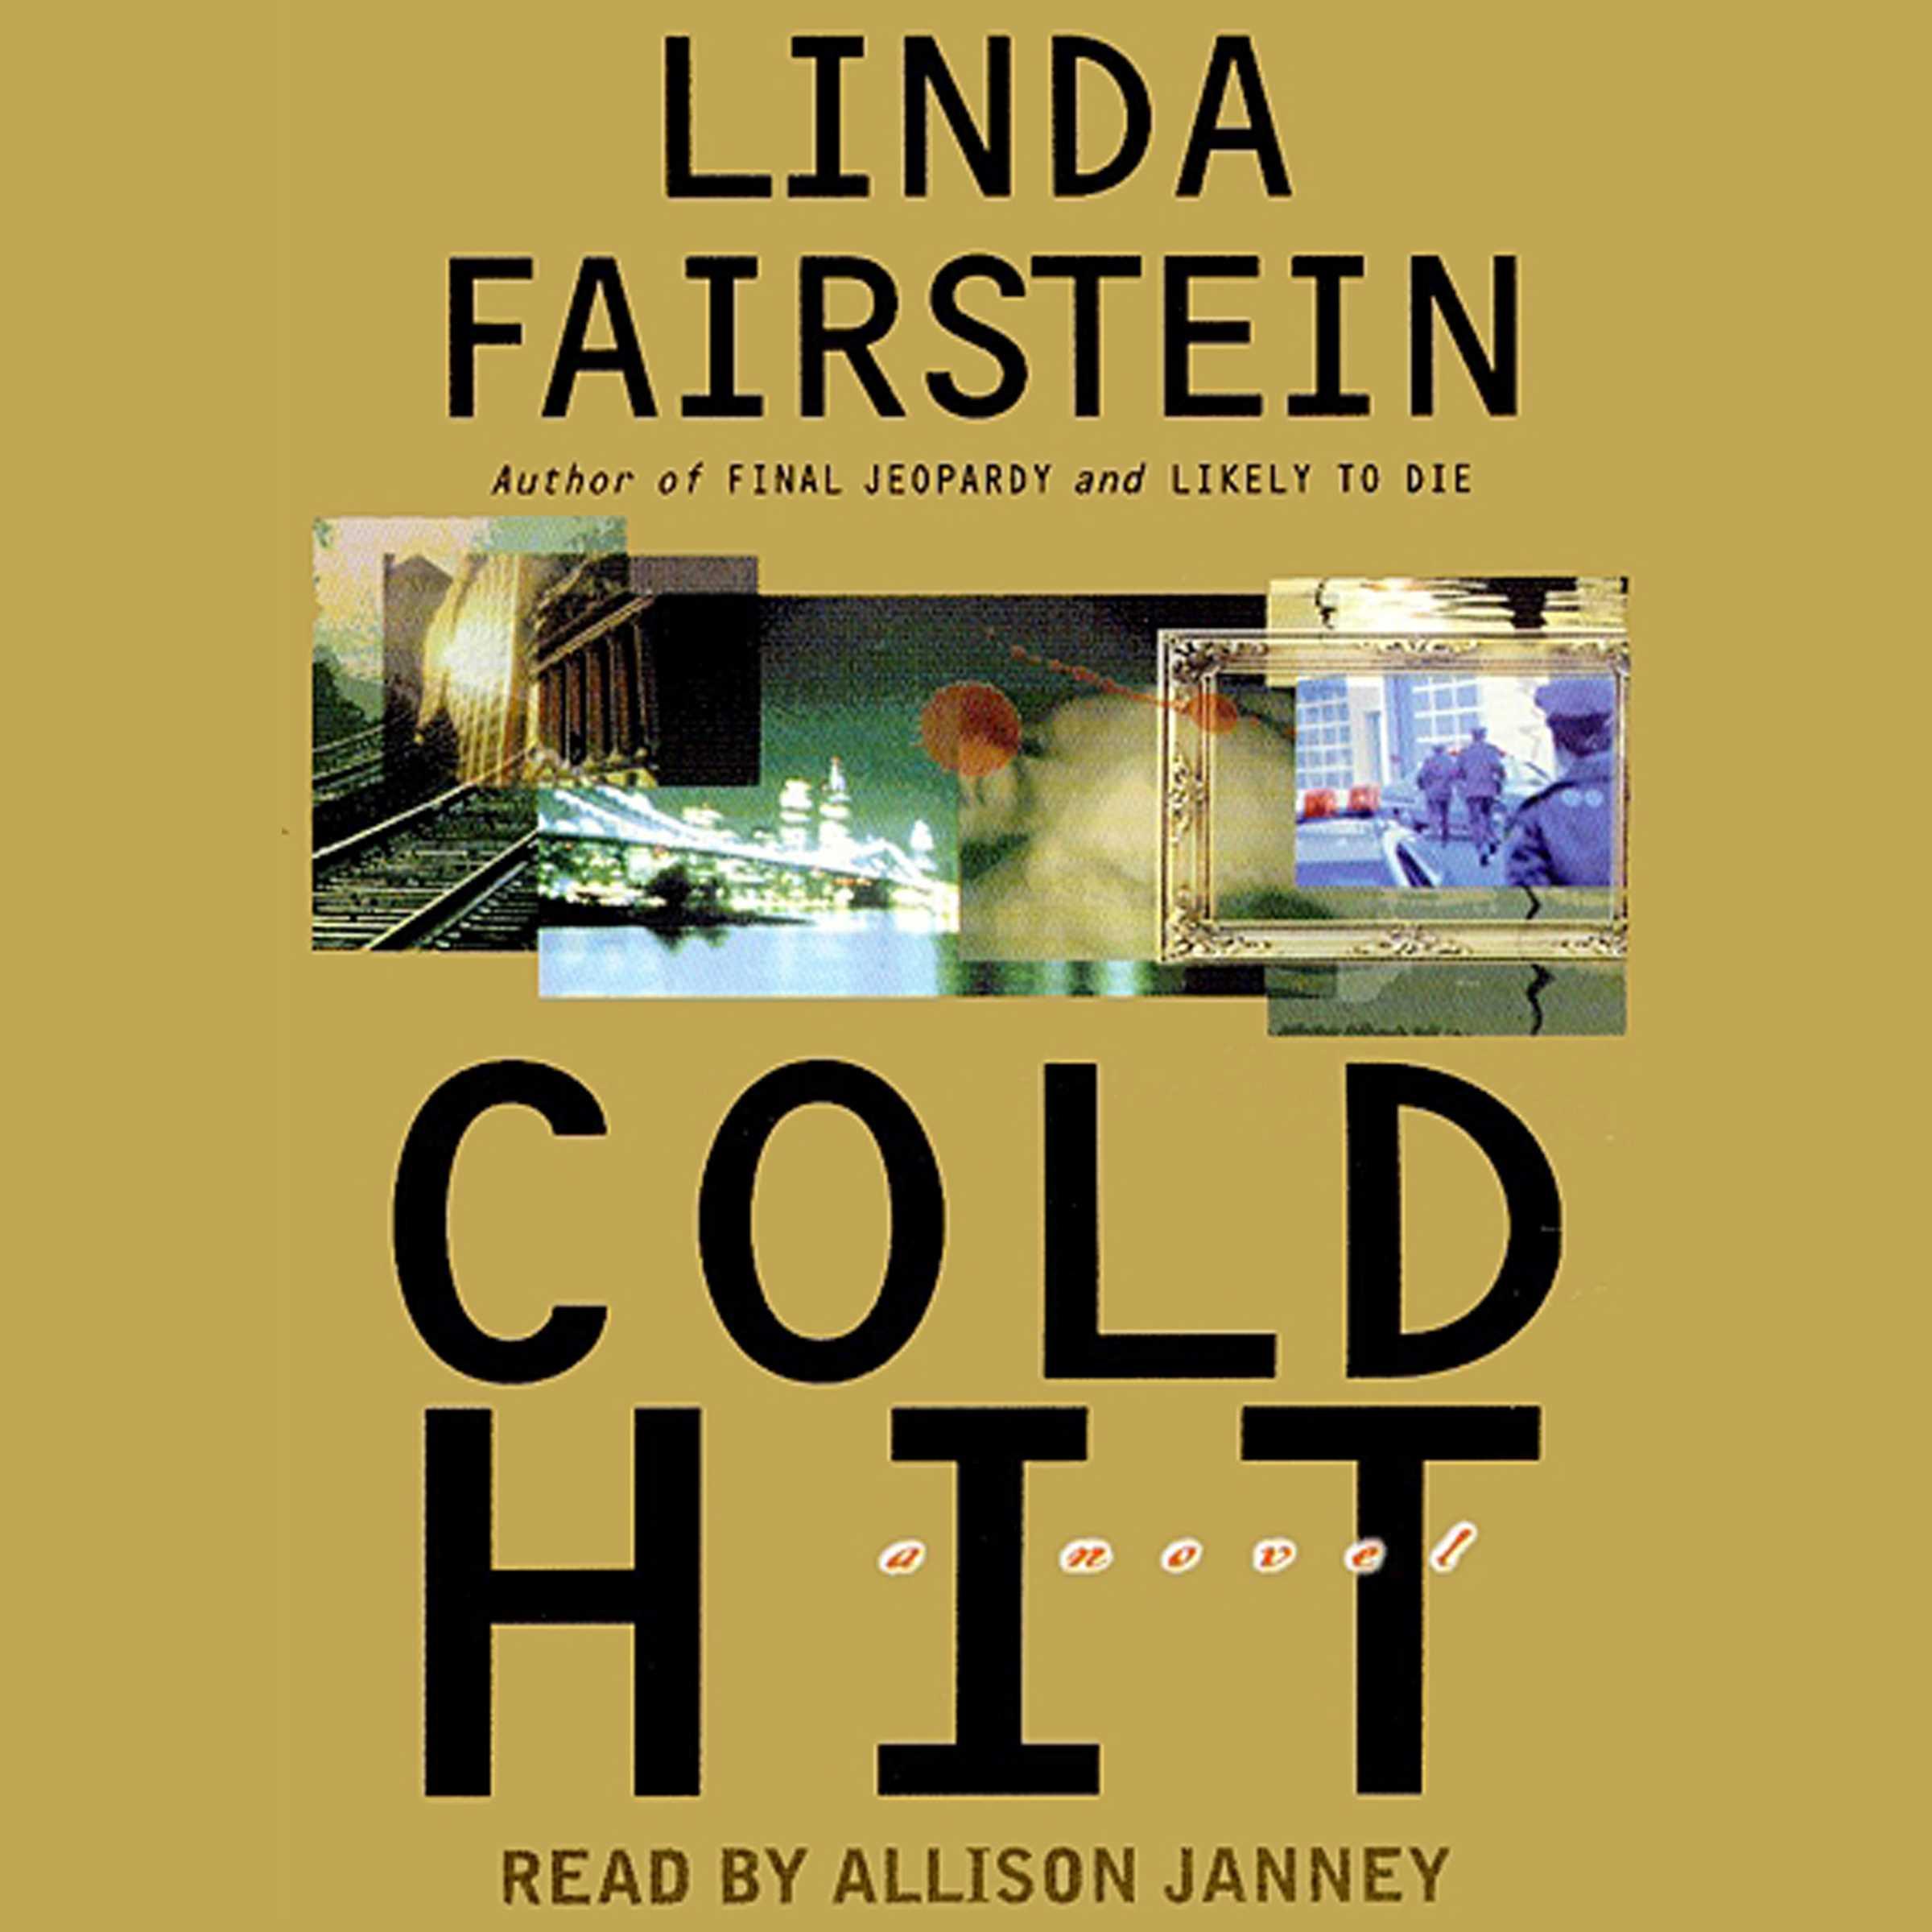 Cold hit 9780743542883 hr